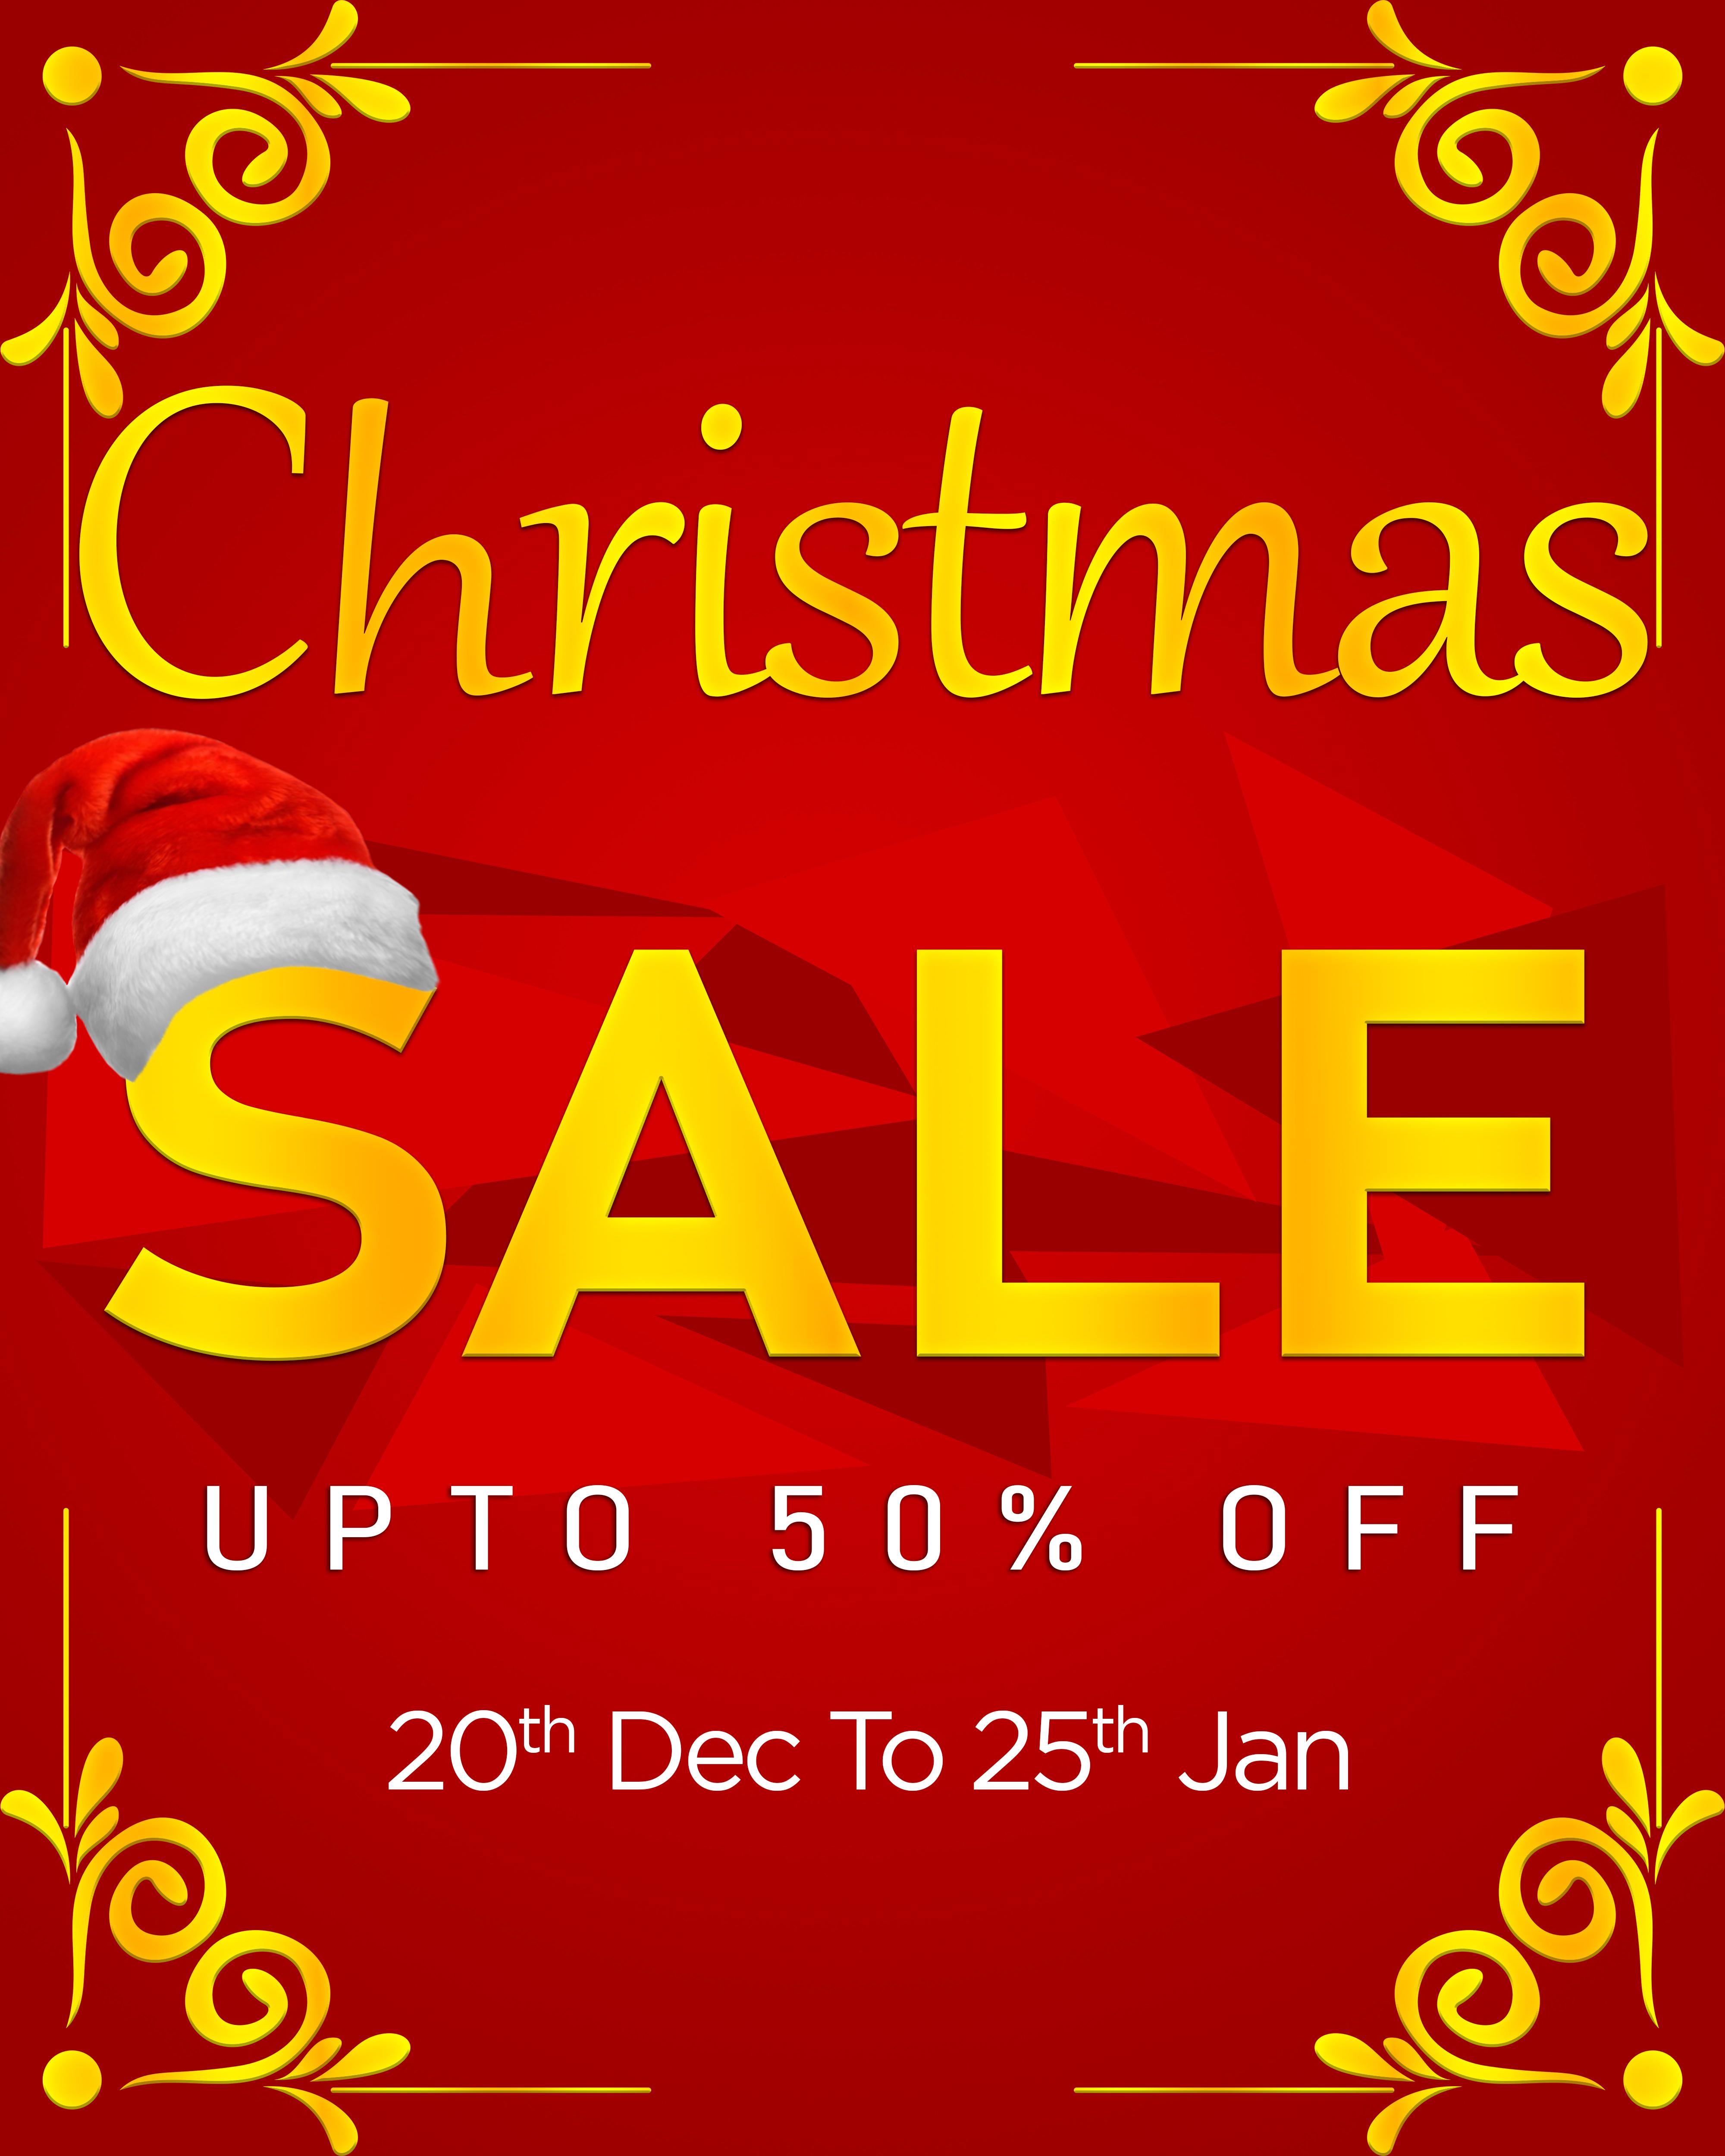 Our Christmas Sale Is On🥳. Get Upto 50% Off🤑http://bit.ly/390cz73 . . . . . . . . . . . . . . . . . . . #sale #christmassale #merrychristmas2019 #christmas2019 #offer #jewellerysale #jewelry #fashionjewellery #artificialjewellery #AnuradhaArtJewellery